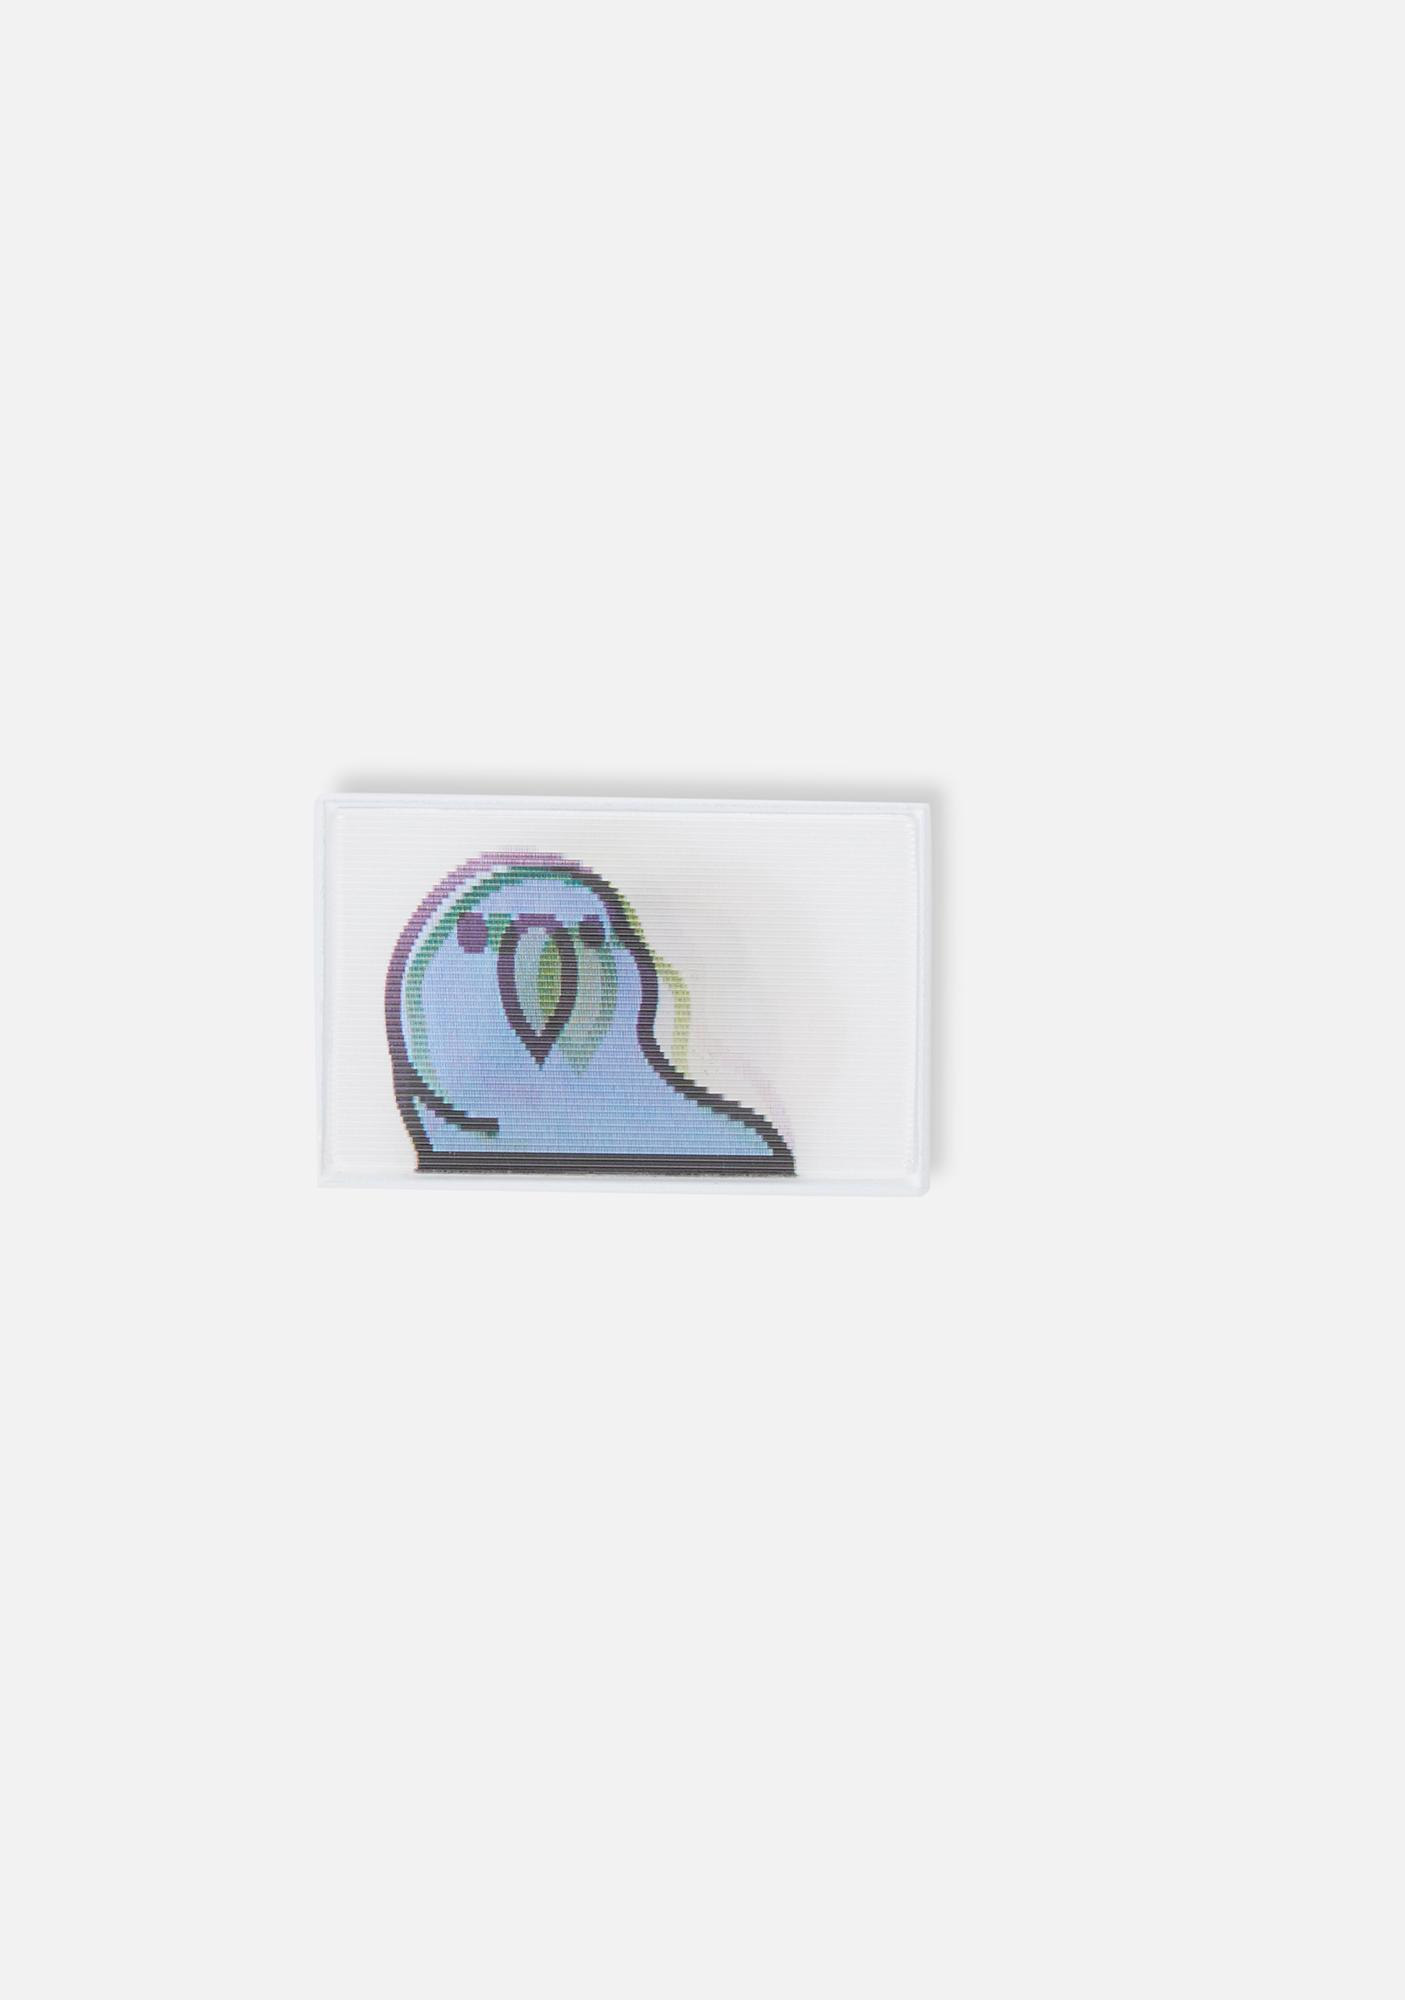 Studio Cult Party Parrot Lenticular Pin